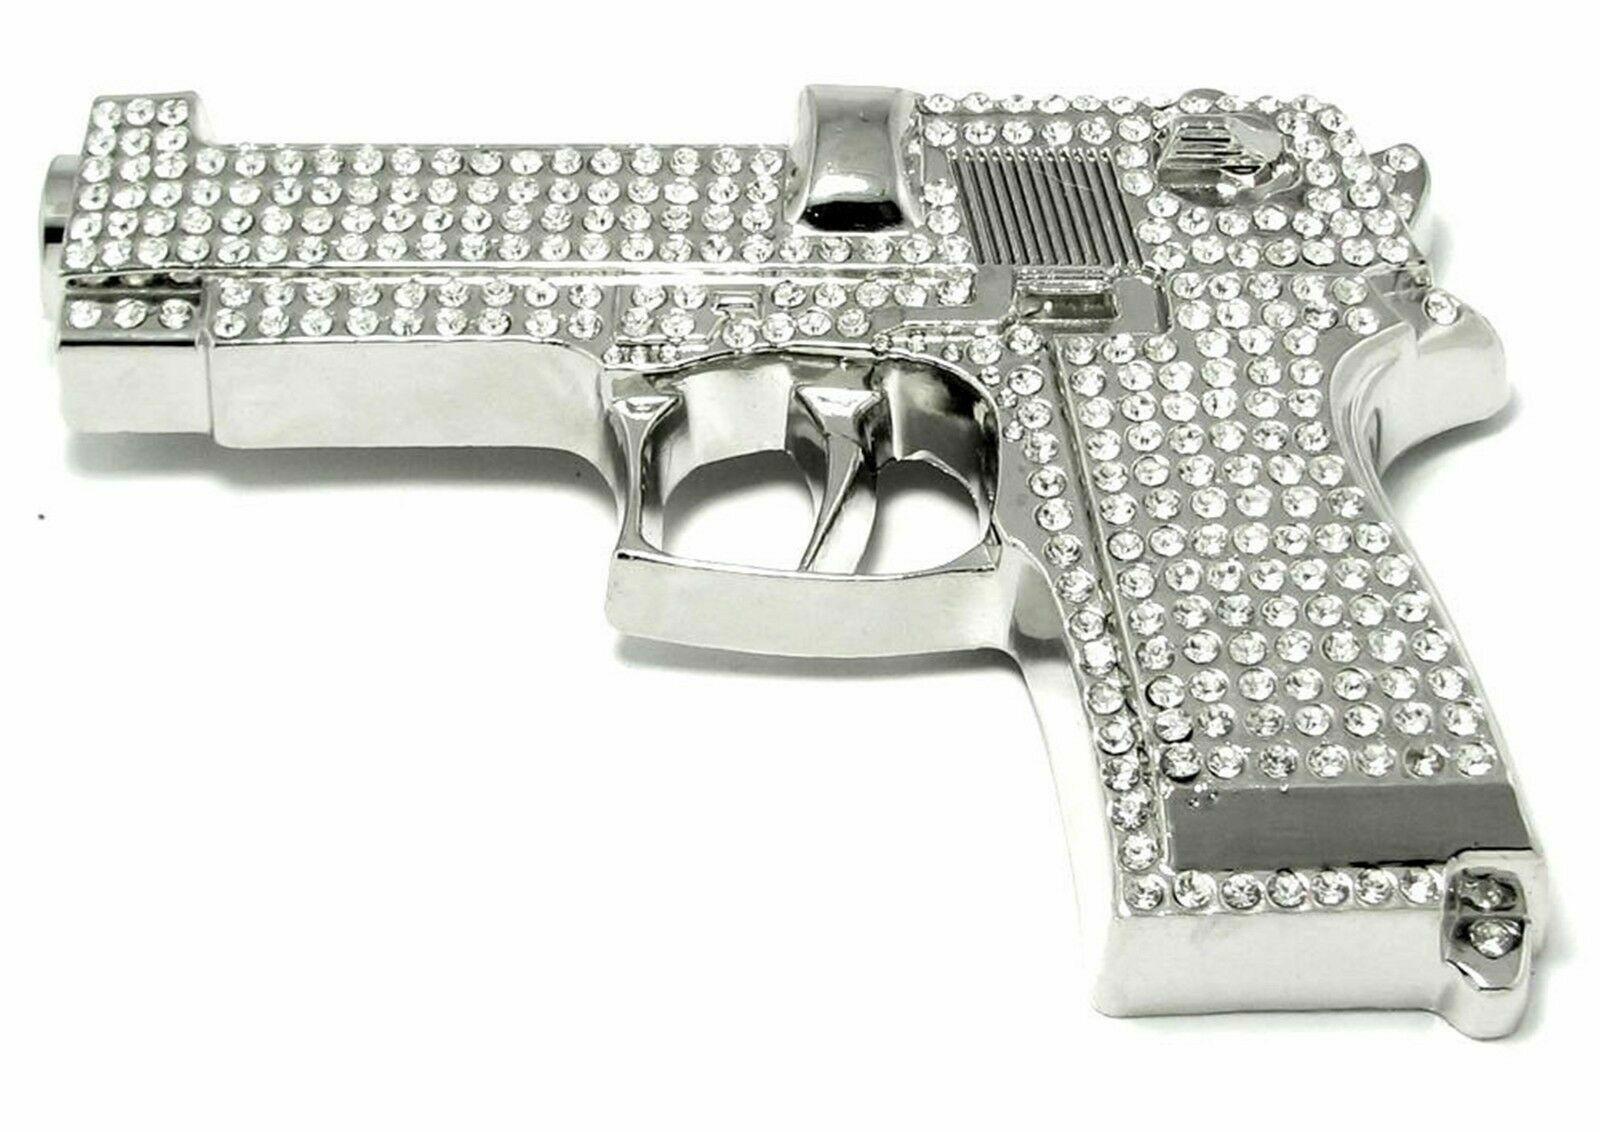 Pistole Gürtelschnalle Voll Von Strass Silber Metal Limited Produktion Bling Out